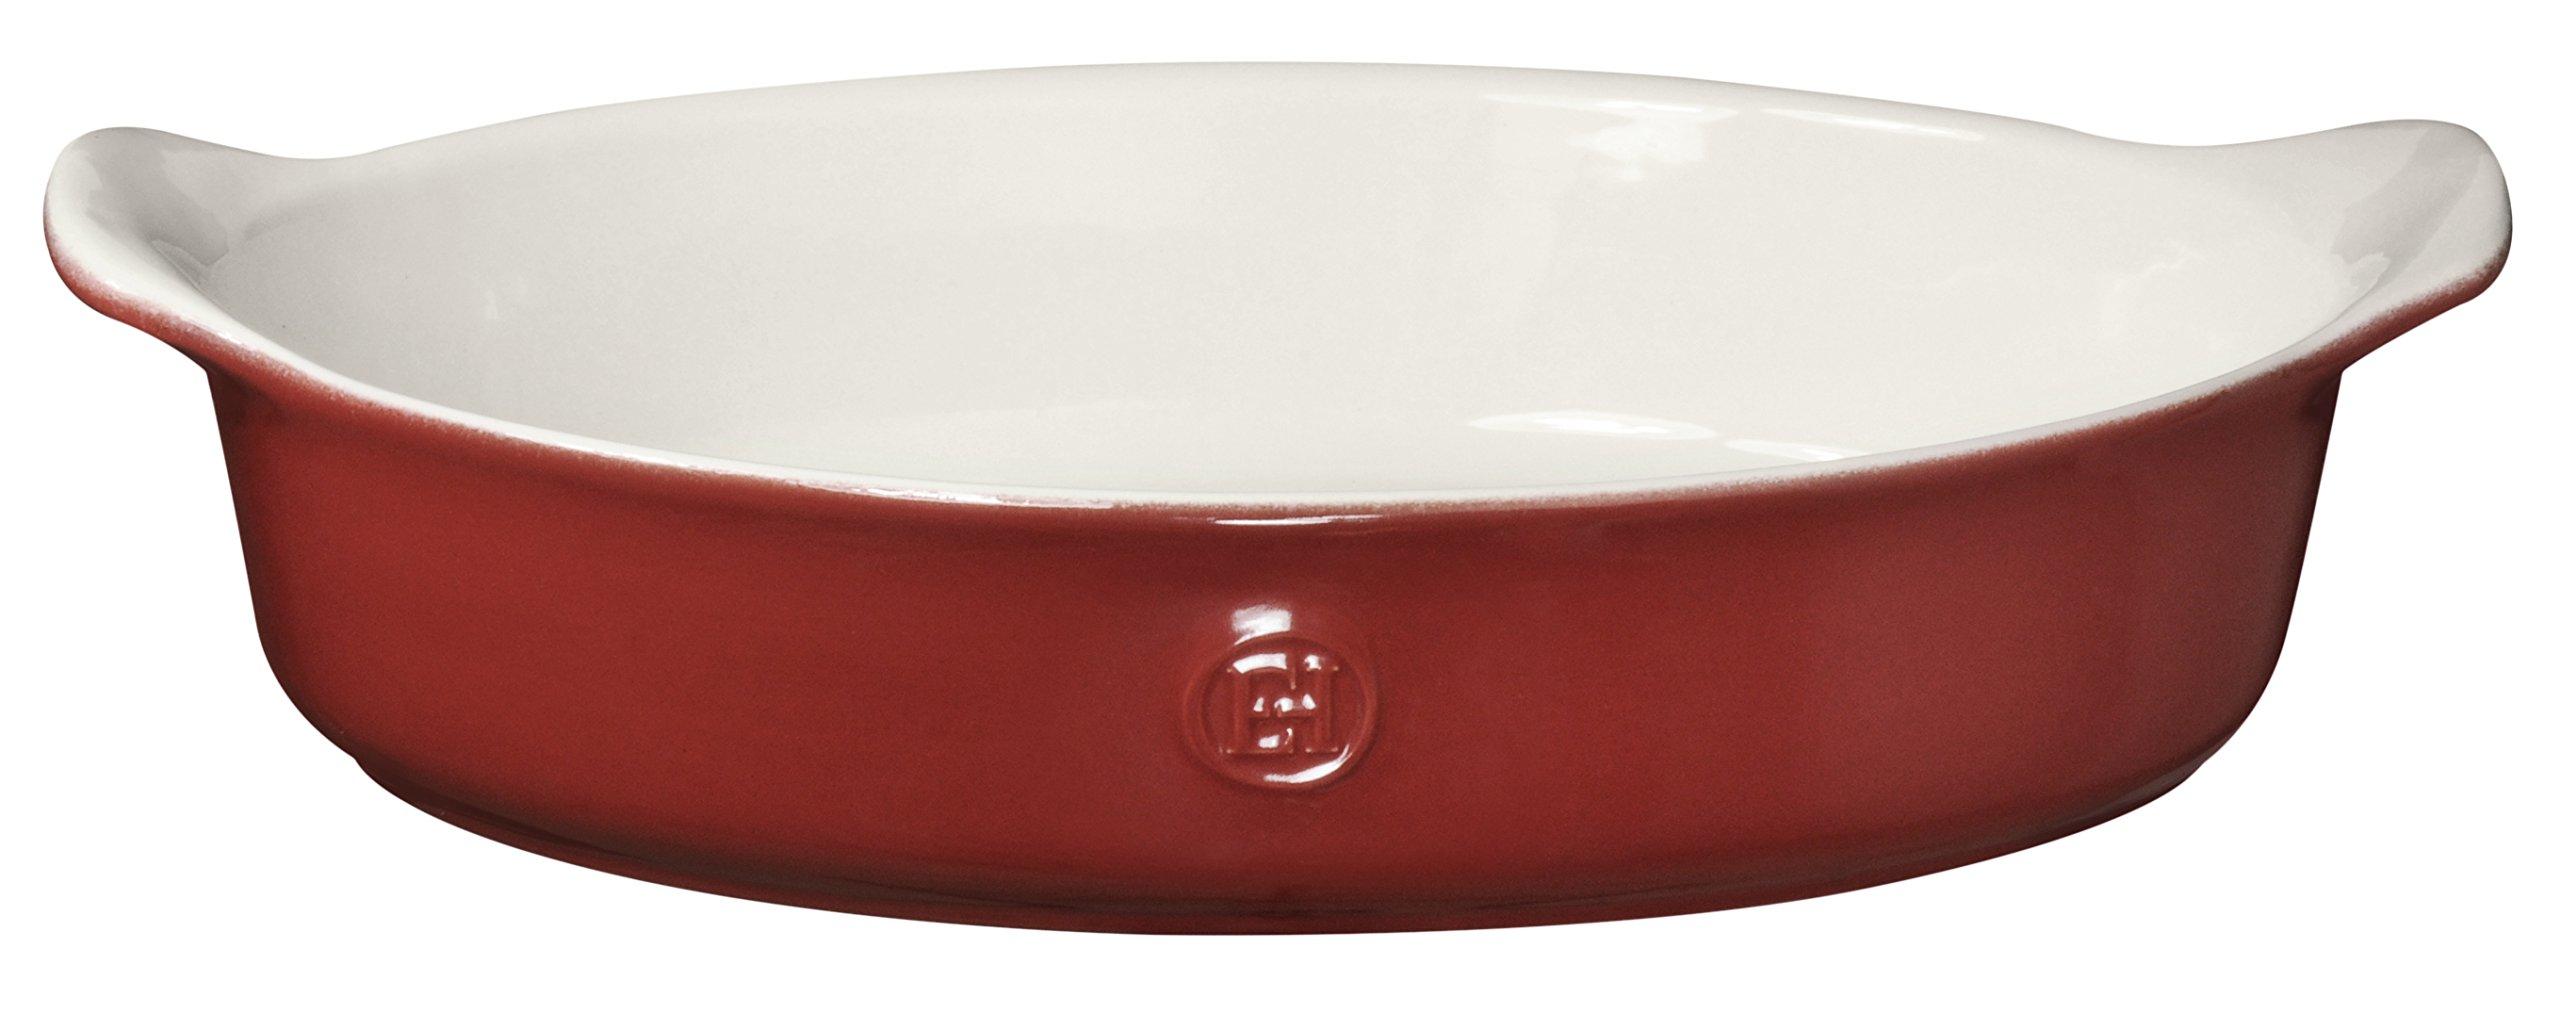 Emile Henry Made In France HR Modern Classics Oval Baker, 14.2 x 9.4'', Red